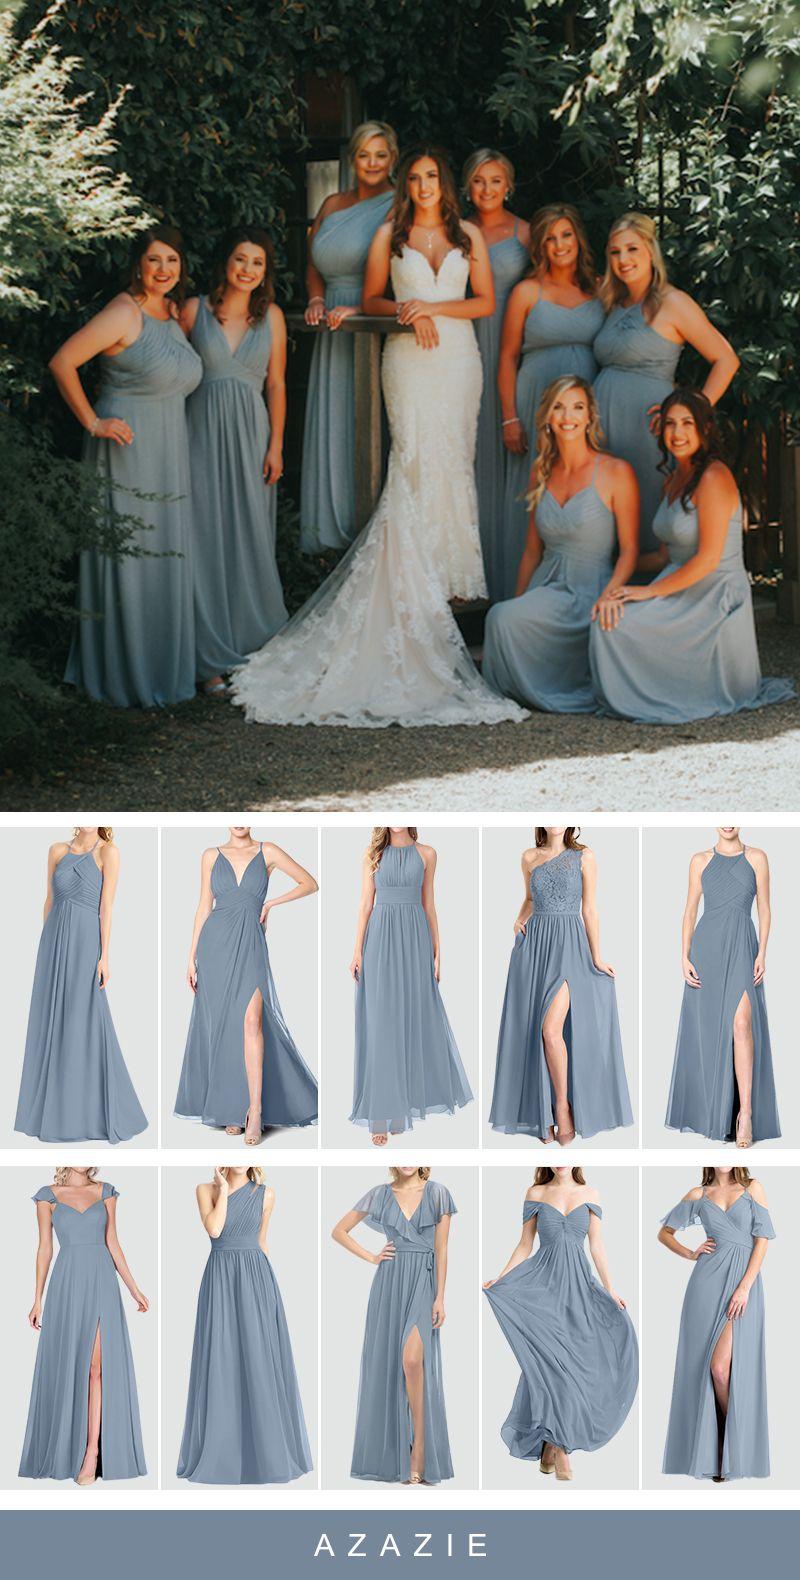 500+ Dusty Blue Bridesmaid Dresses